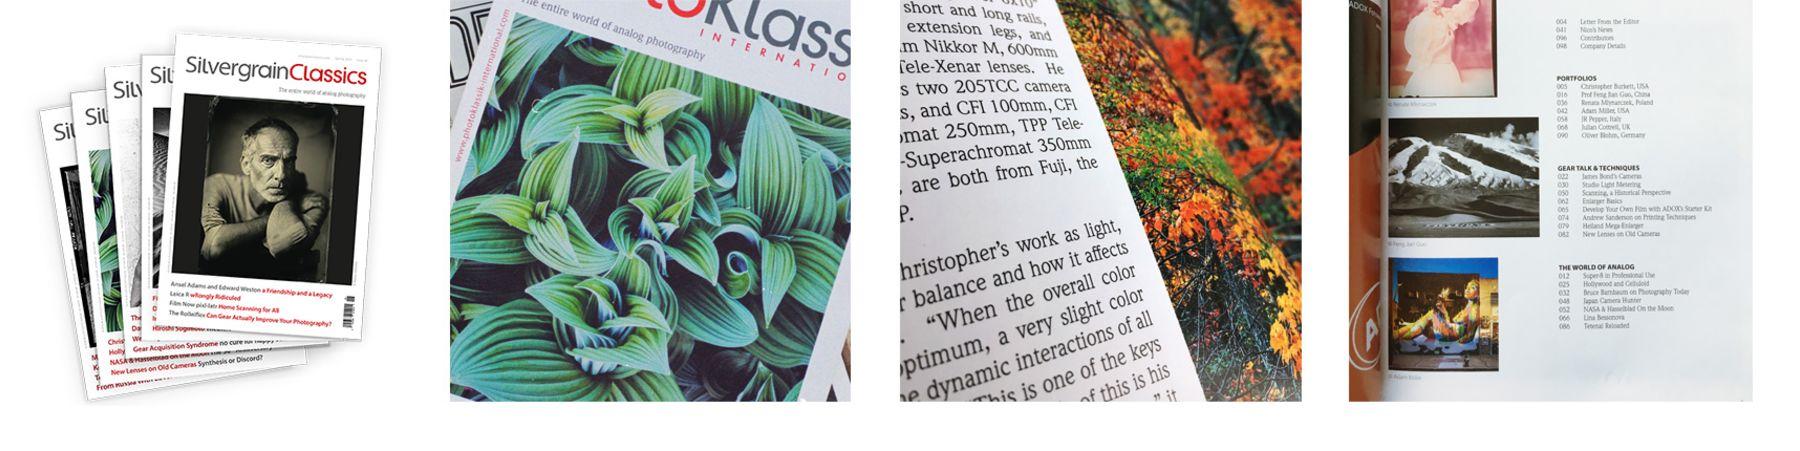 SilvergrainClassics: Premium quarterly publication on film photography